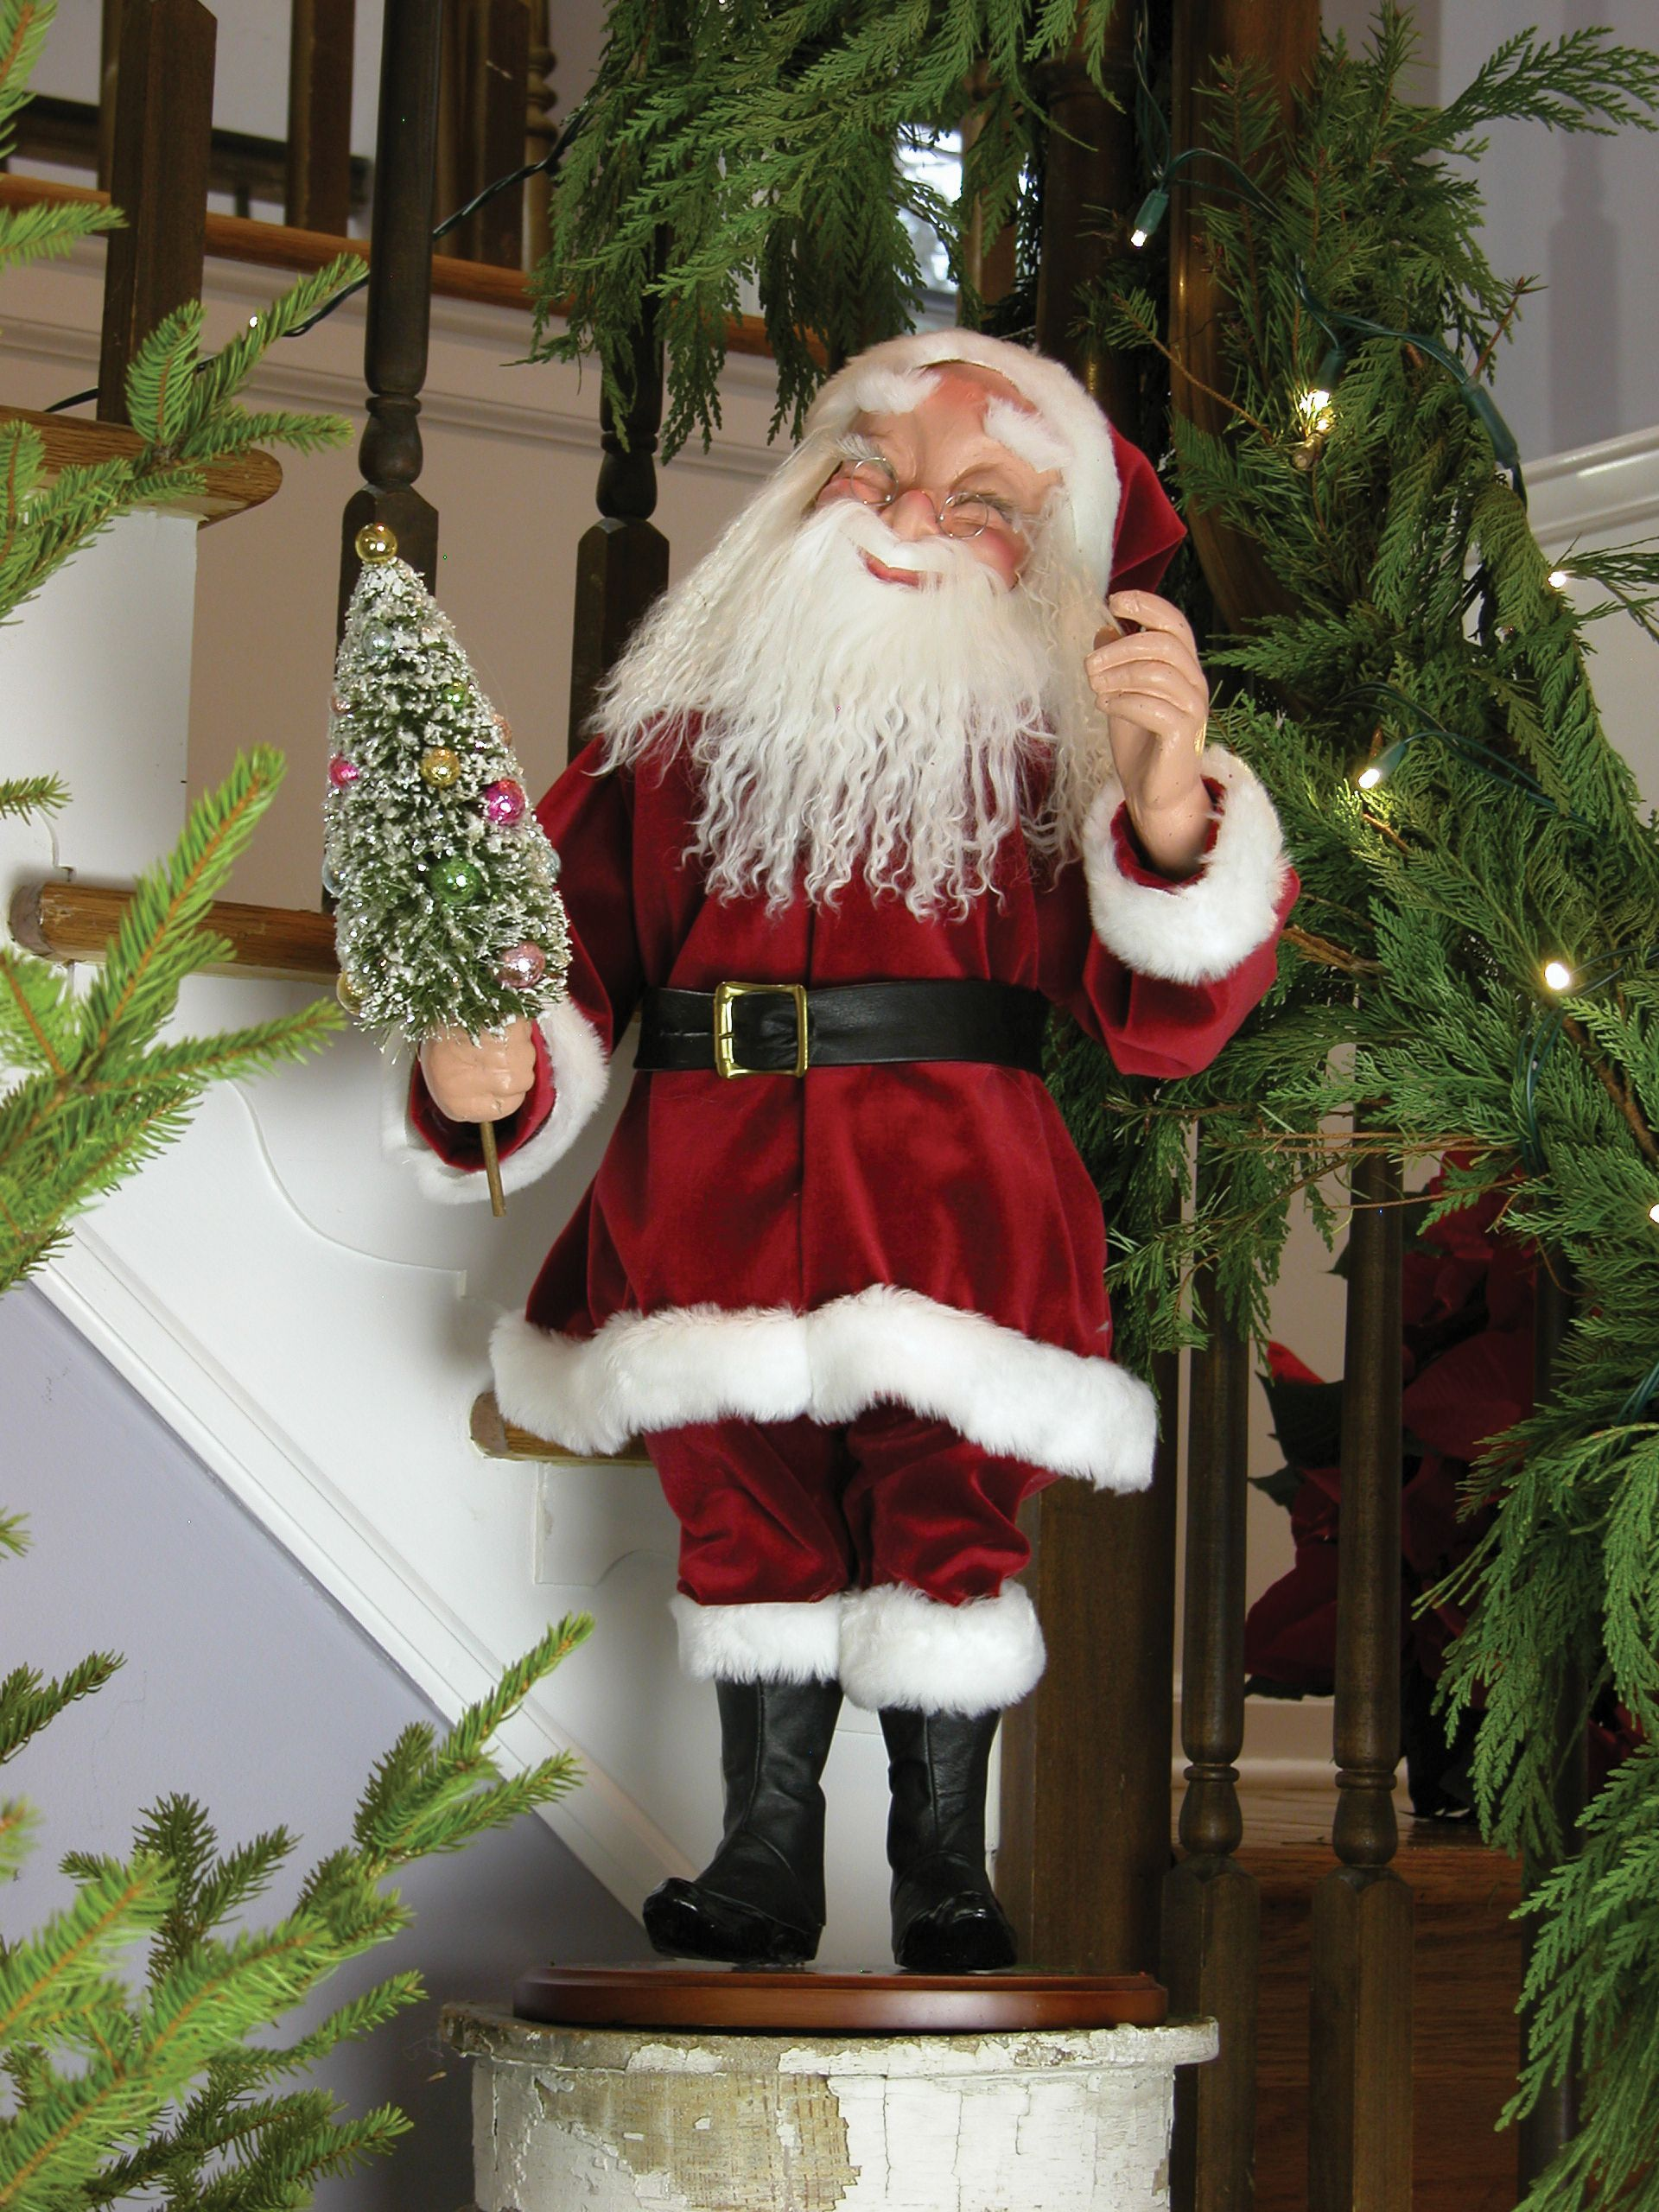 Christmas carolers figurines for sale - Byers Choice Carolers Clockwork Nodder Santa